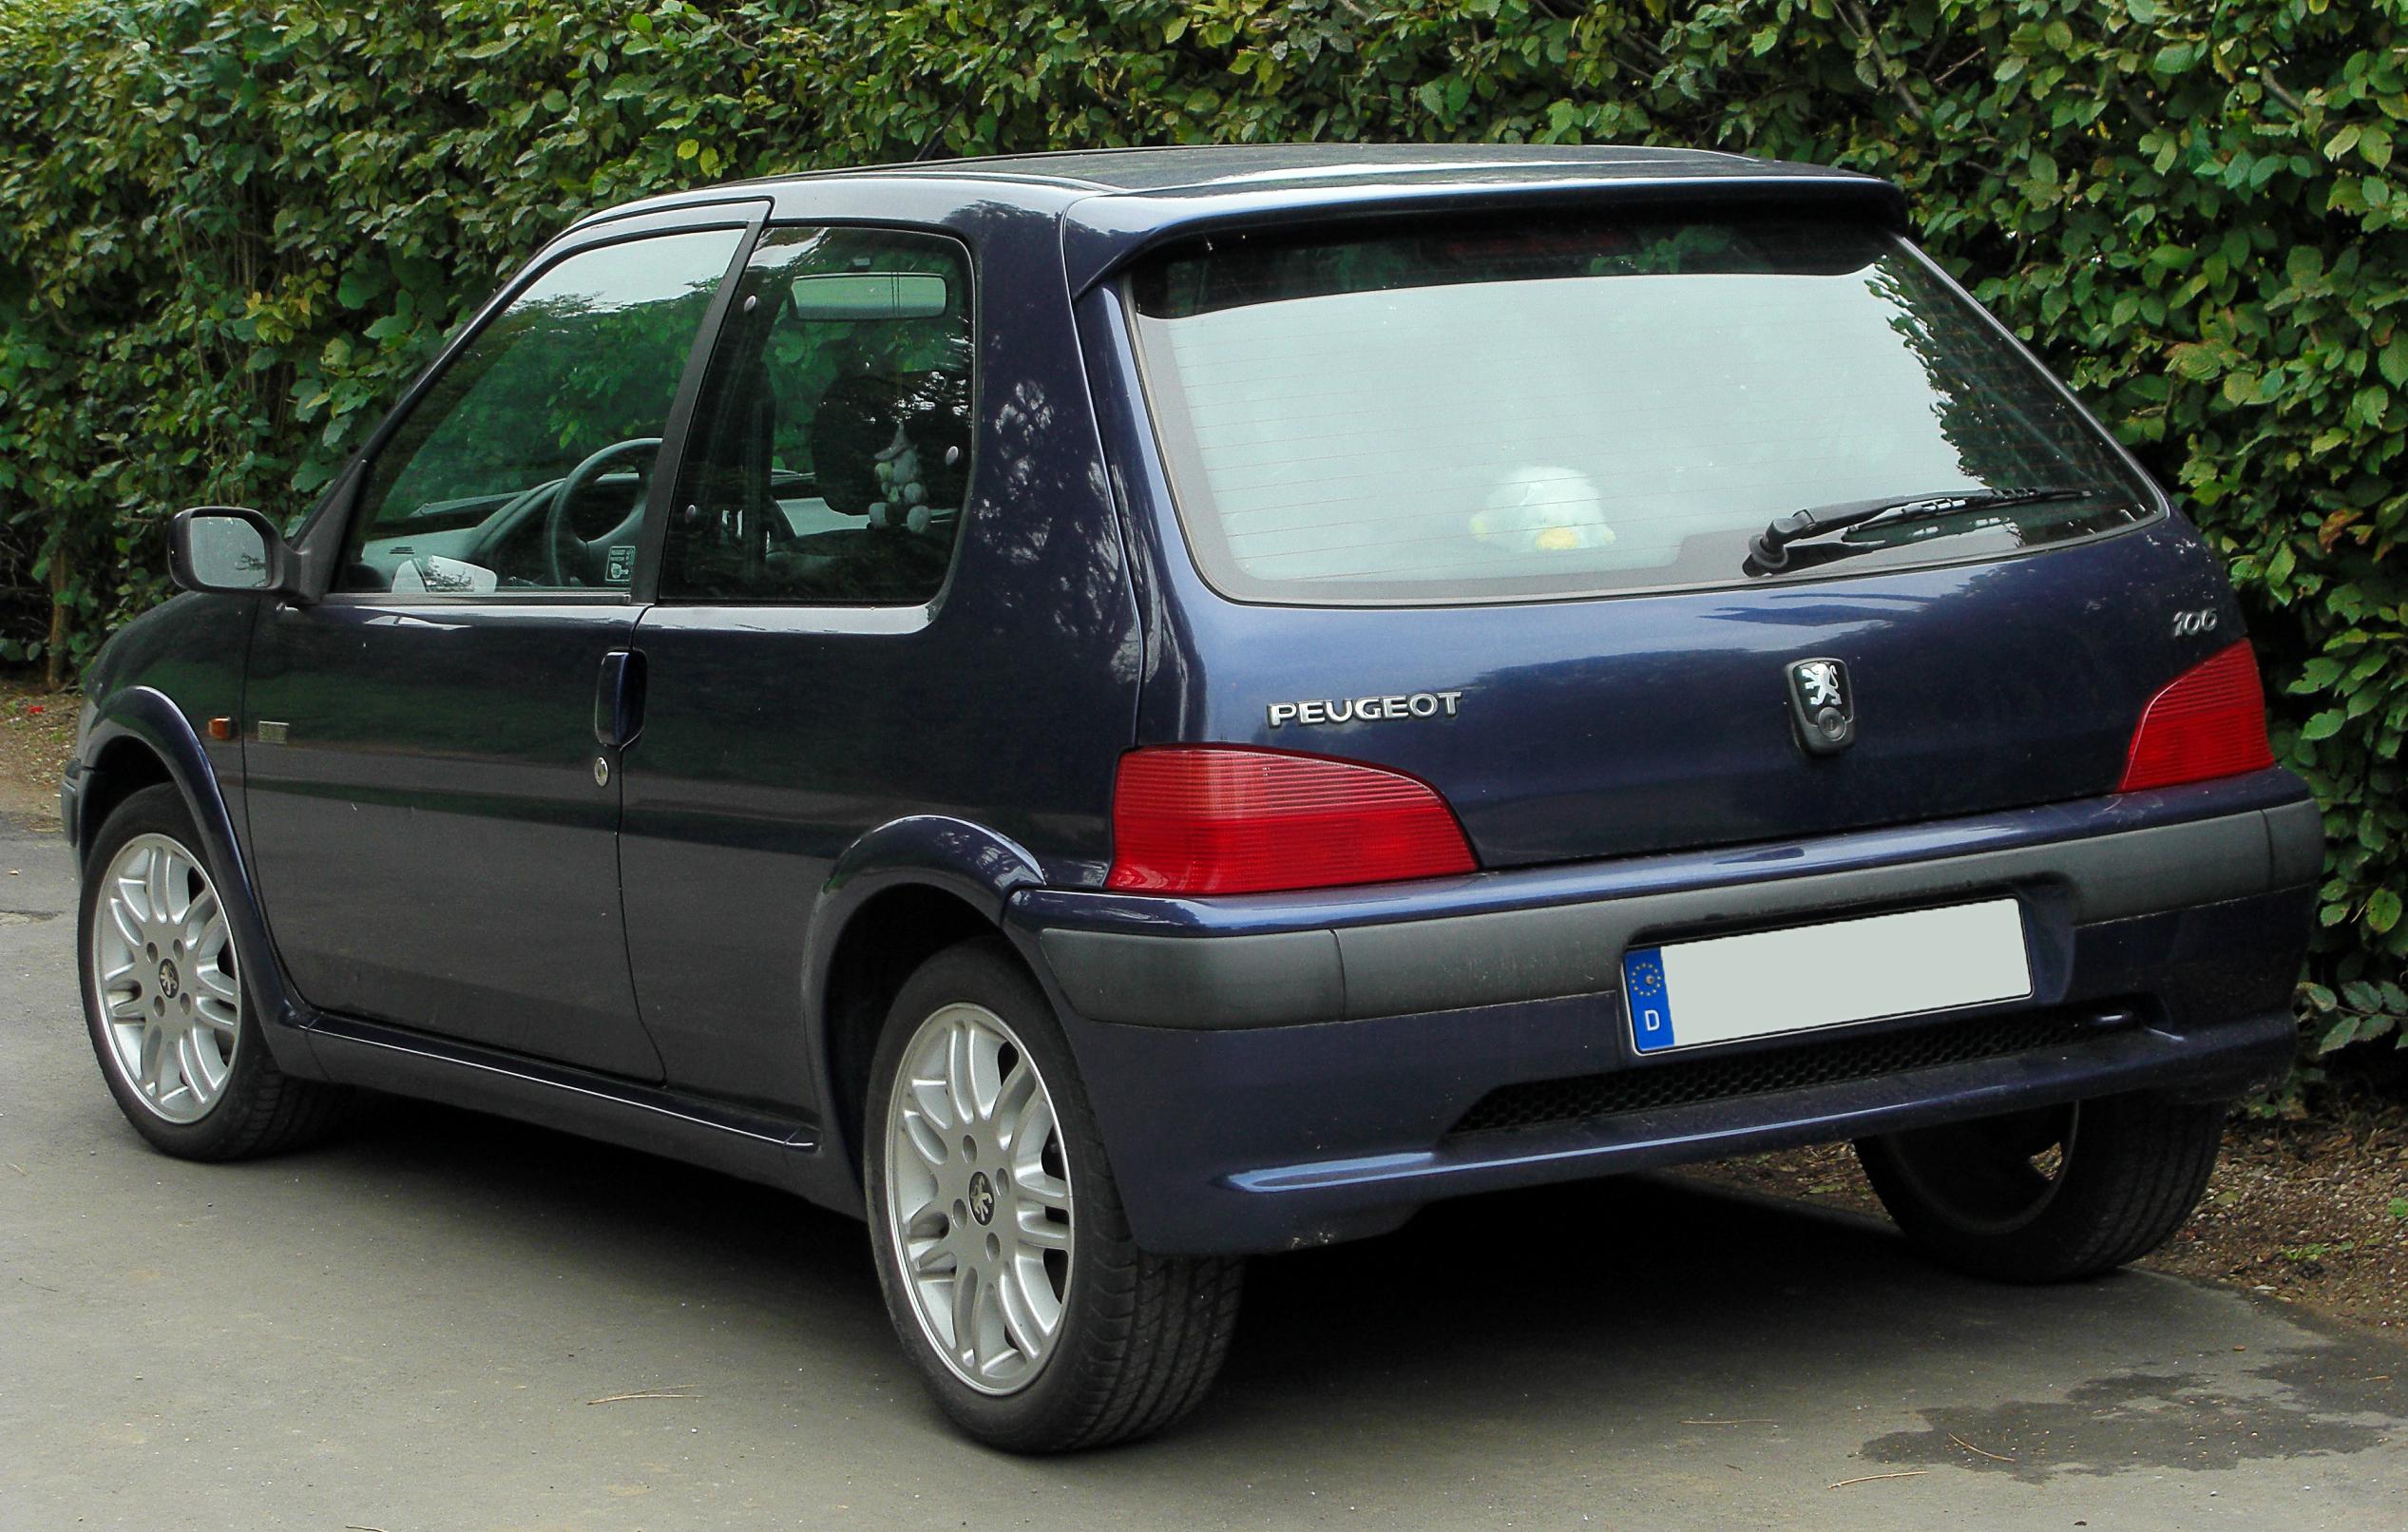 Peugeot >> File:Peugeot 106 Sport Facelift rear 20100914.jpg - Wikimedia Commons